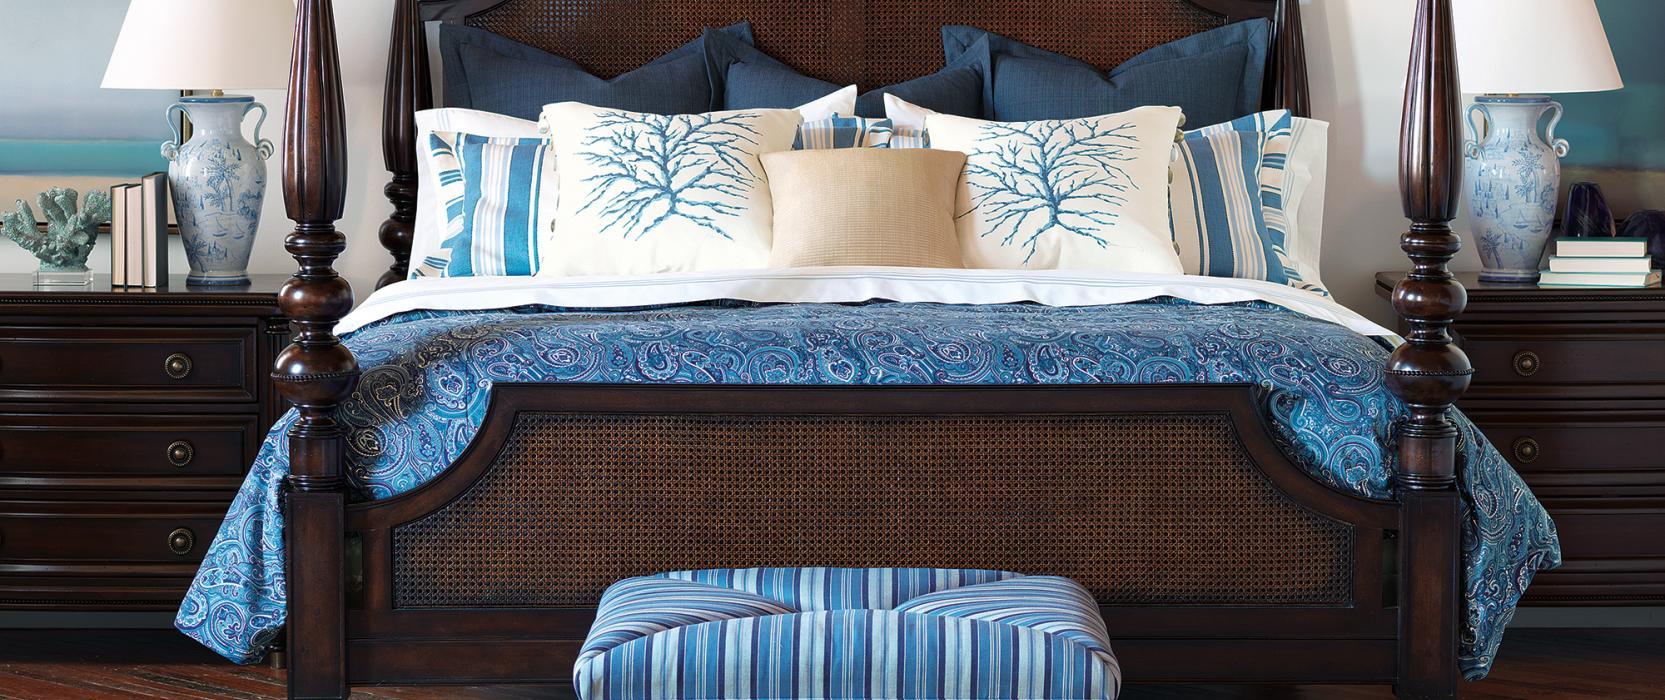 Home Bedding Interior Design